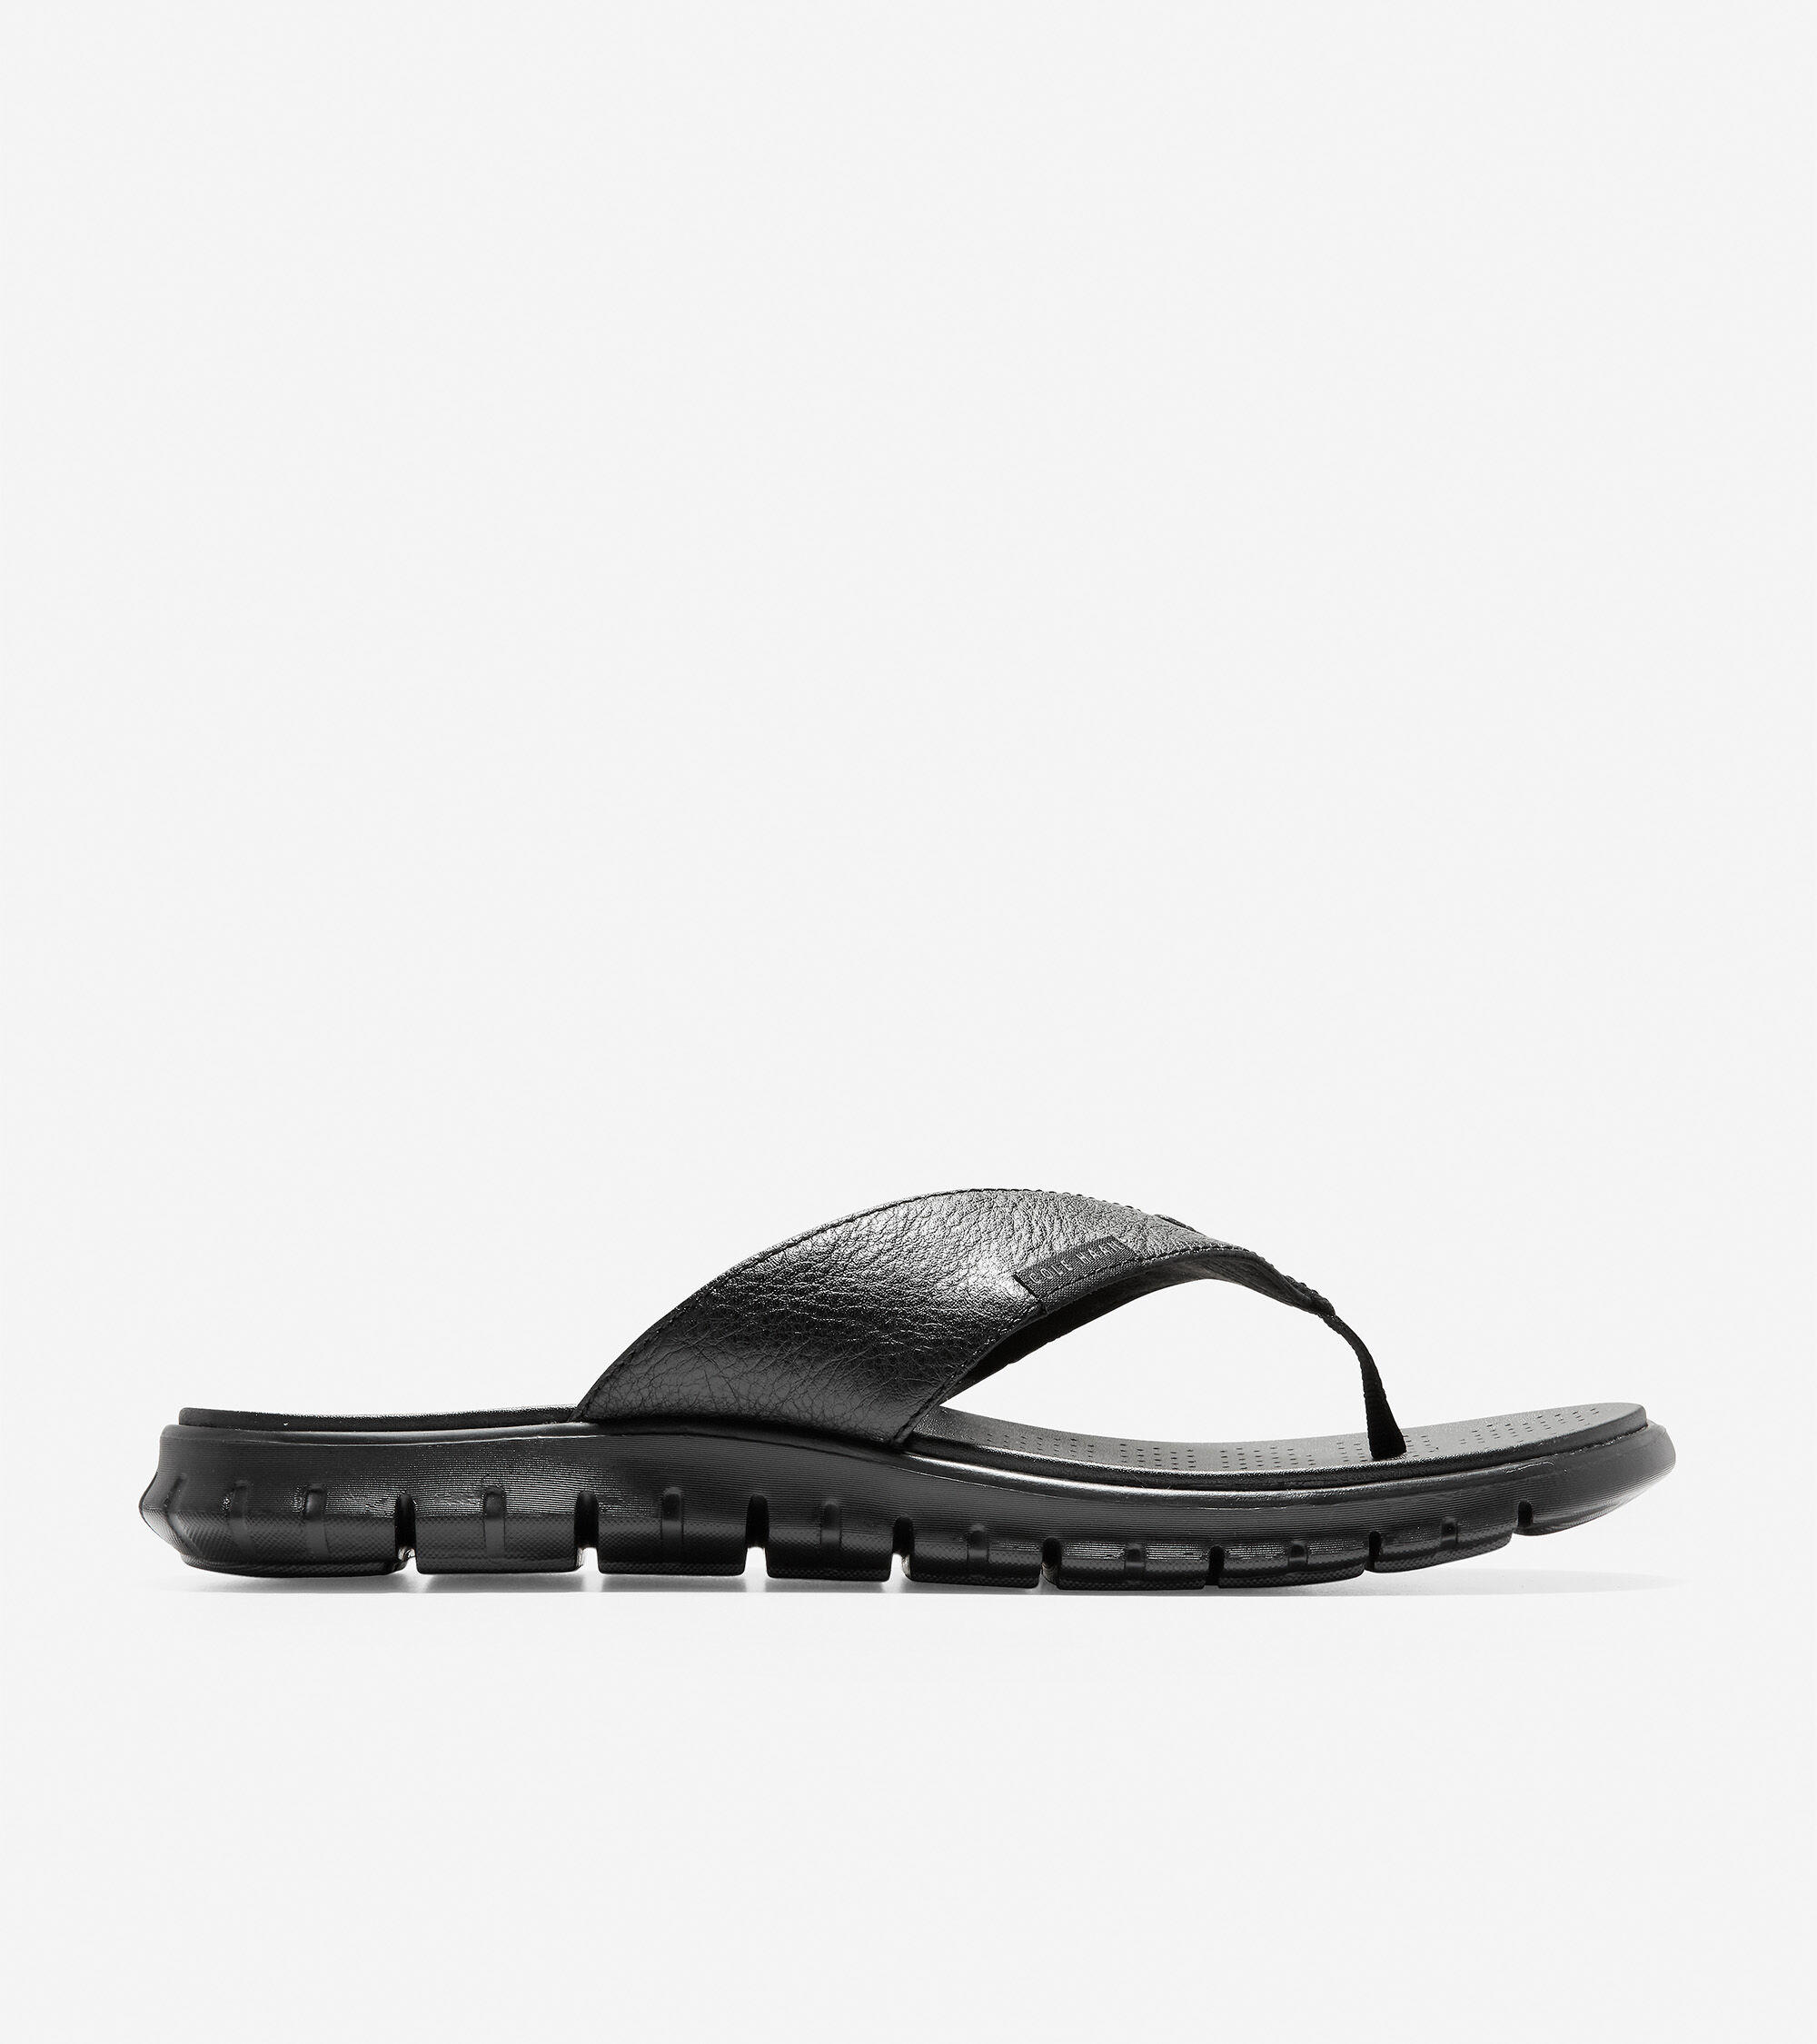 9e2226c0f Men s ZEROGRAND Thong Sandals in Black